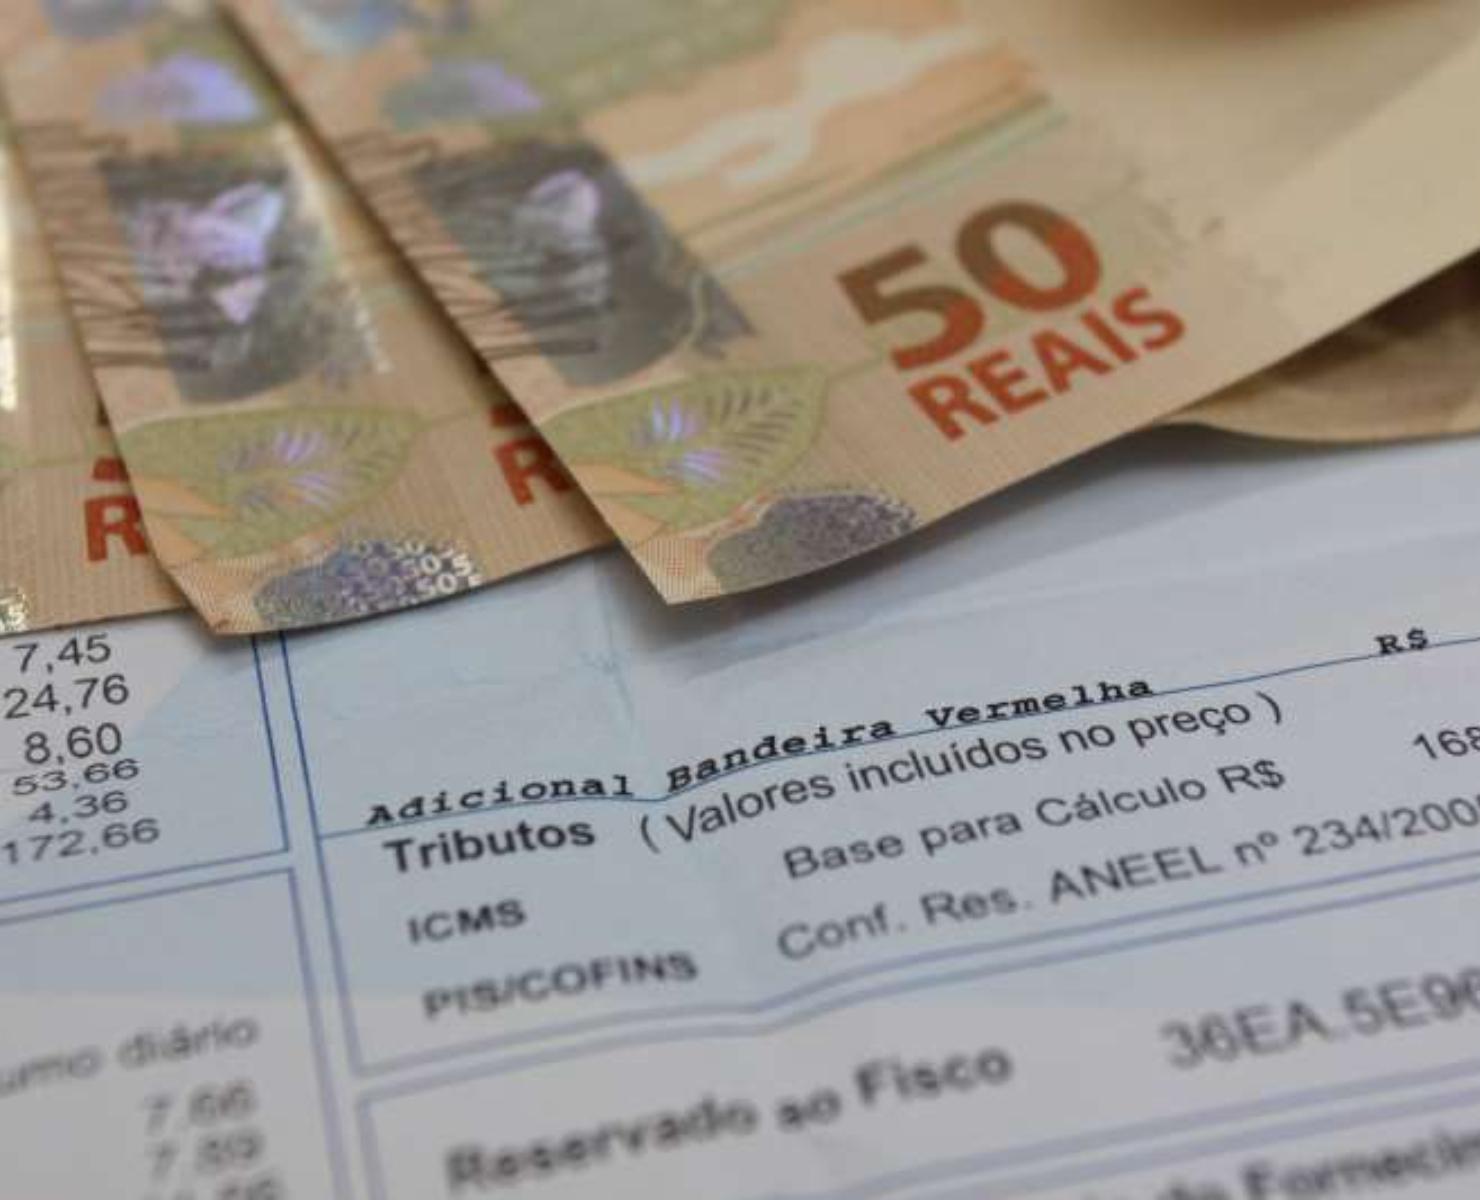 LUZ: ERRO NA CONTA PODE RENDER MULTA DE R$ 10 MIL